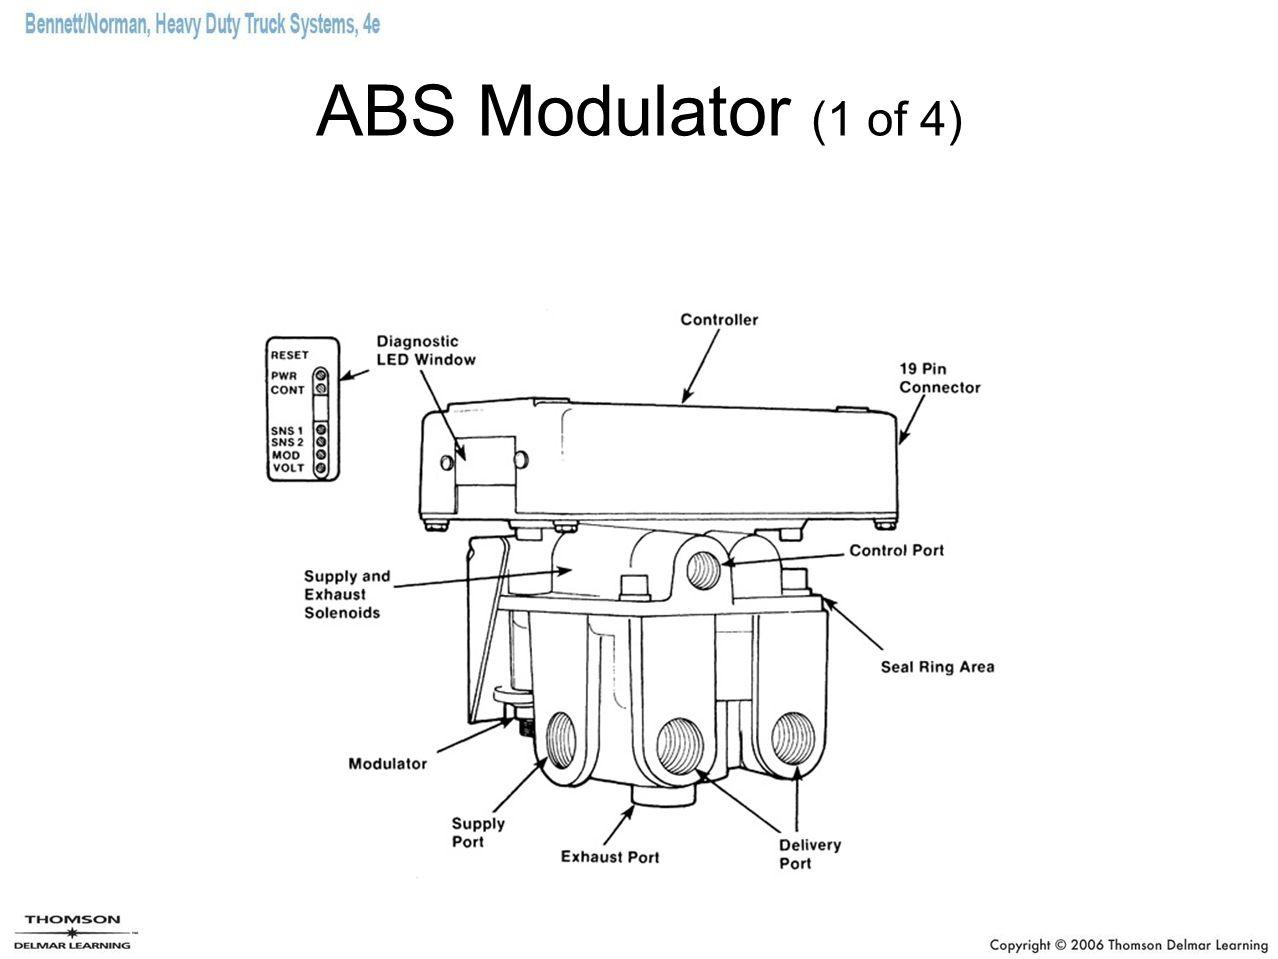 ABS Modulator (1 of 4)